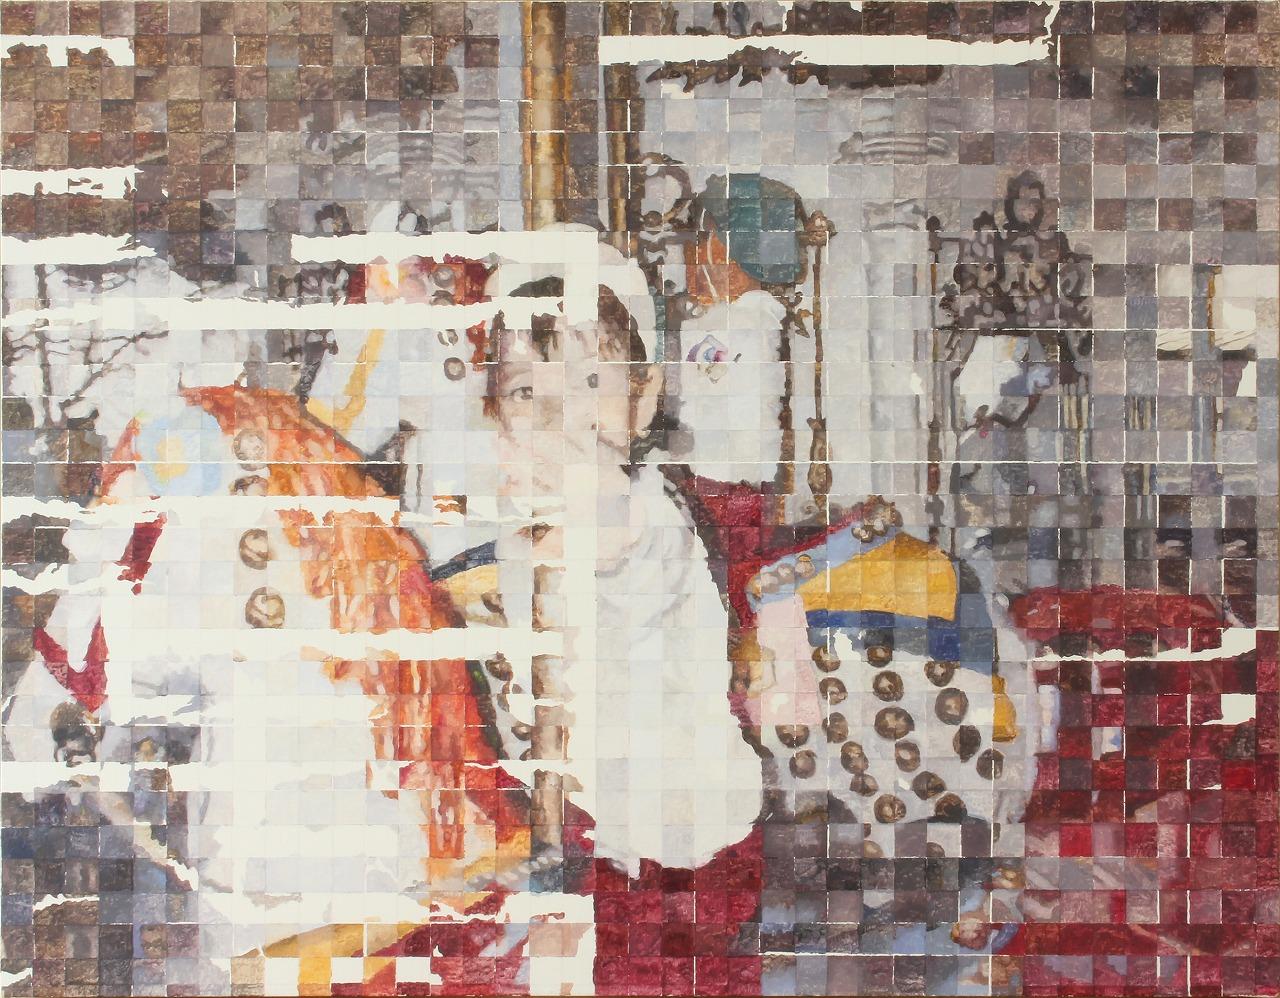 Shiori Tono, <em>Friday</em>, 2018, oil on canvas, 91.0 x 116.7 cm